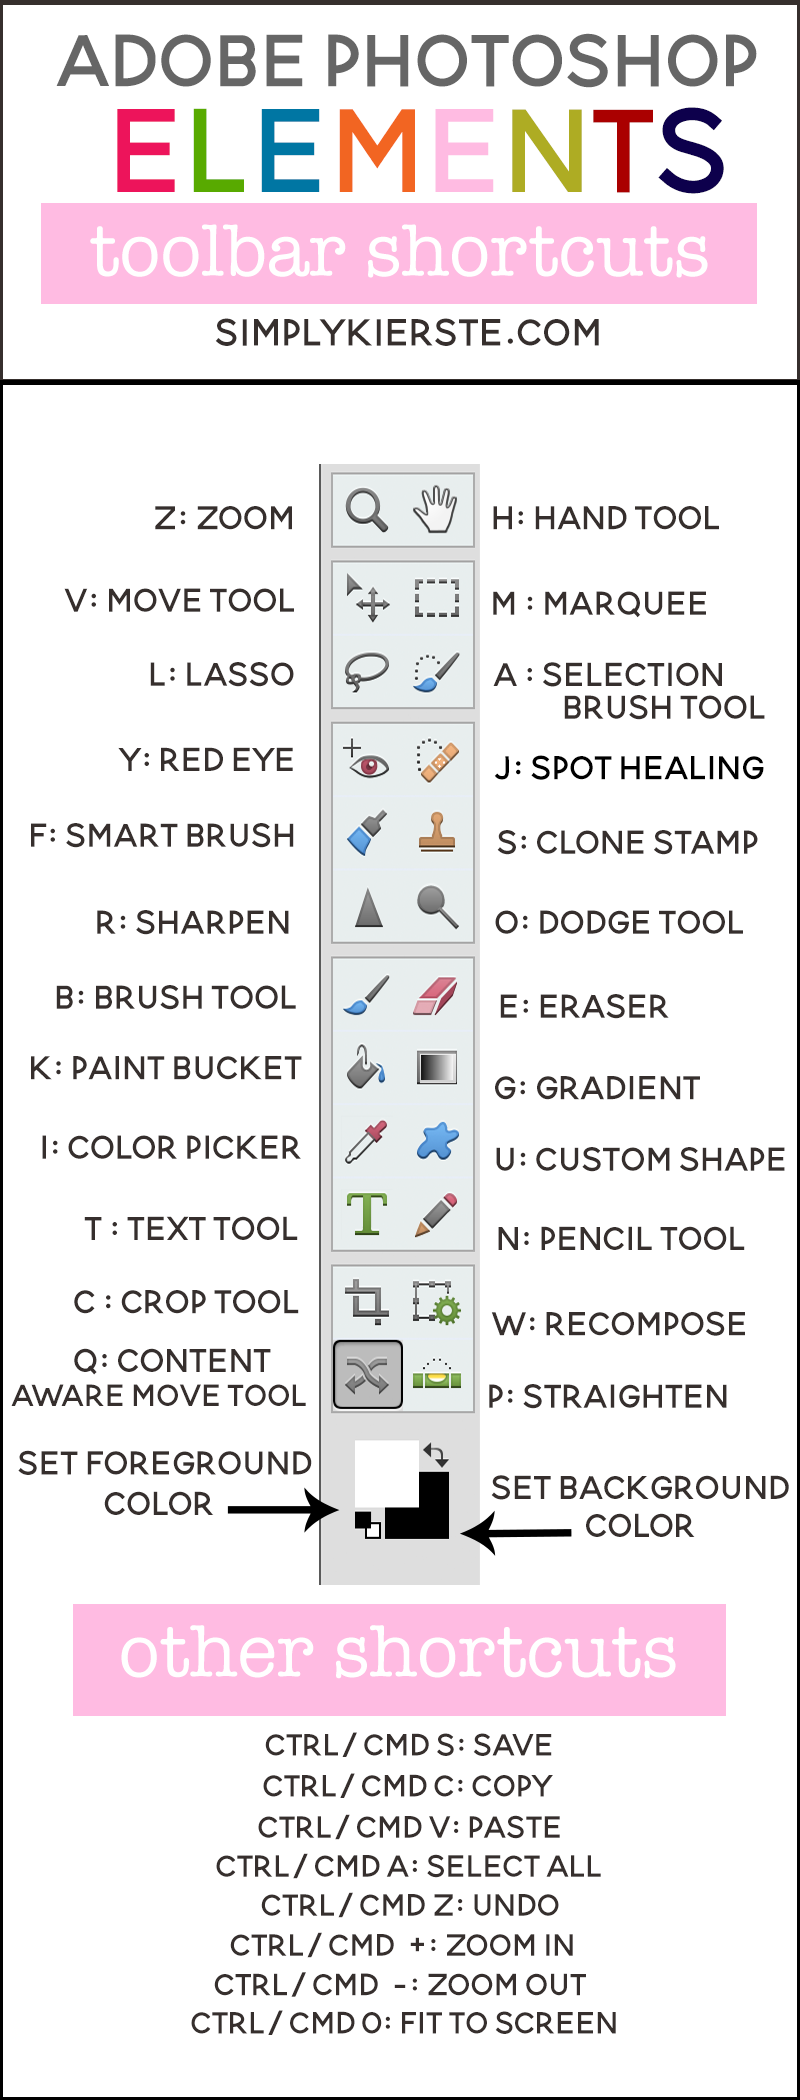 Adobe Photoshop Elements Shortcuts